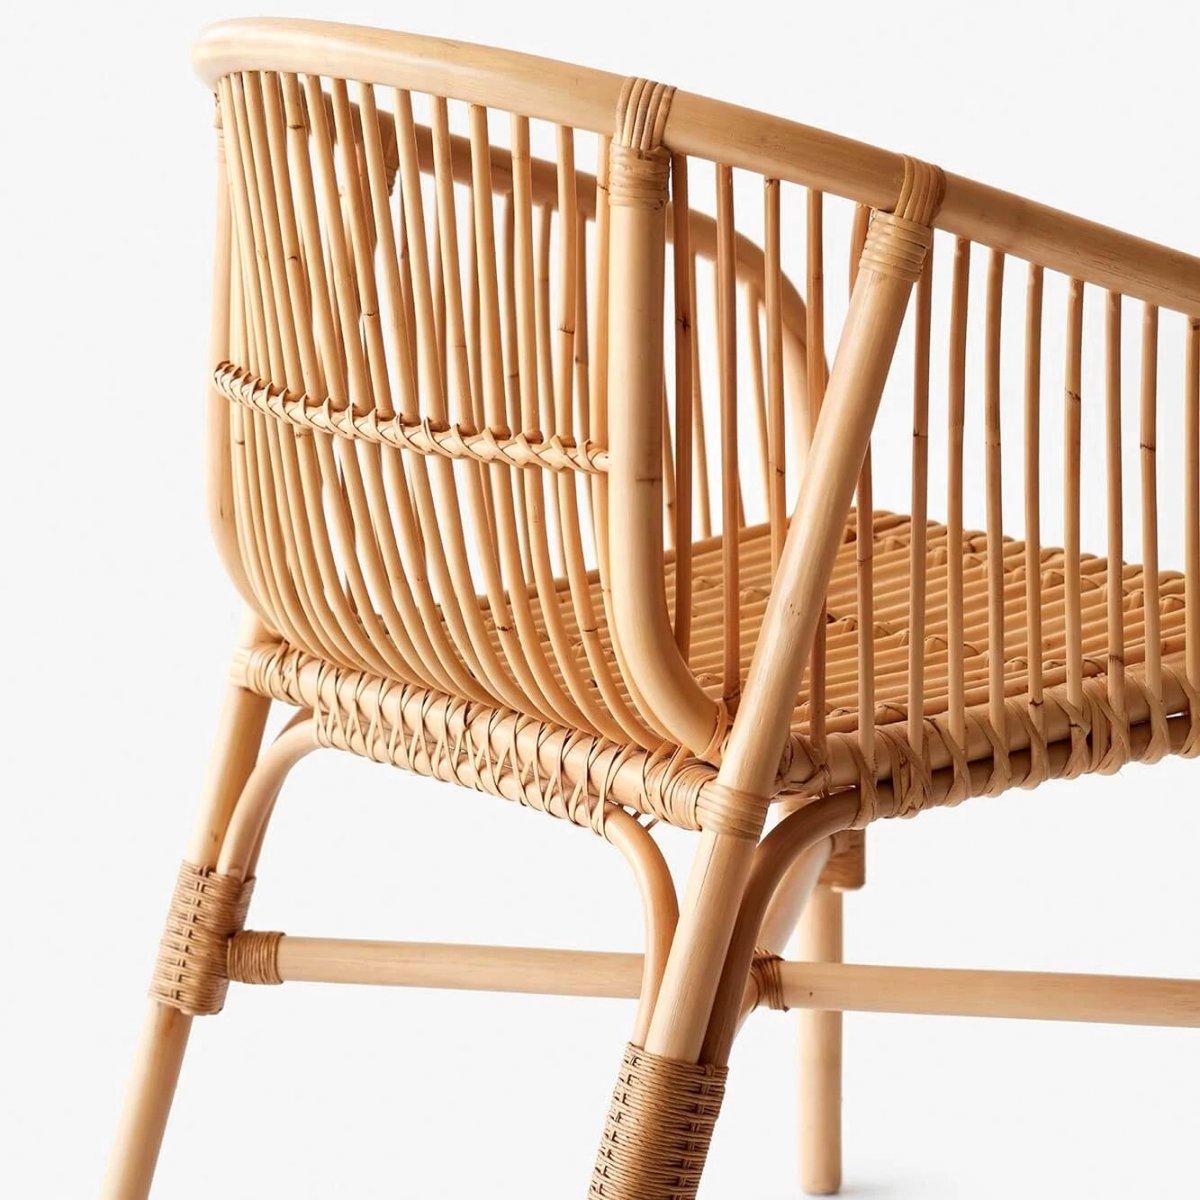 Jakarta Rattan Dining Chair, detail.